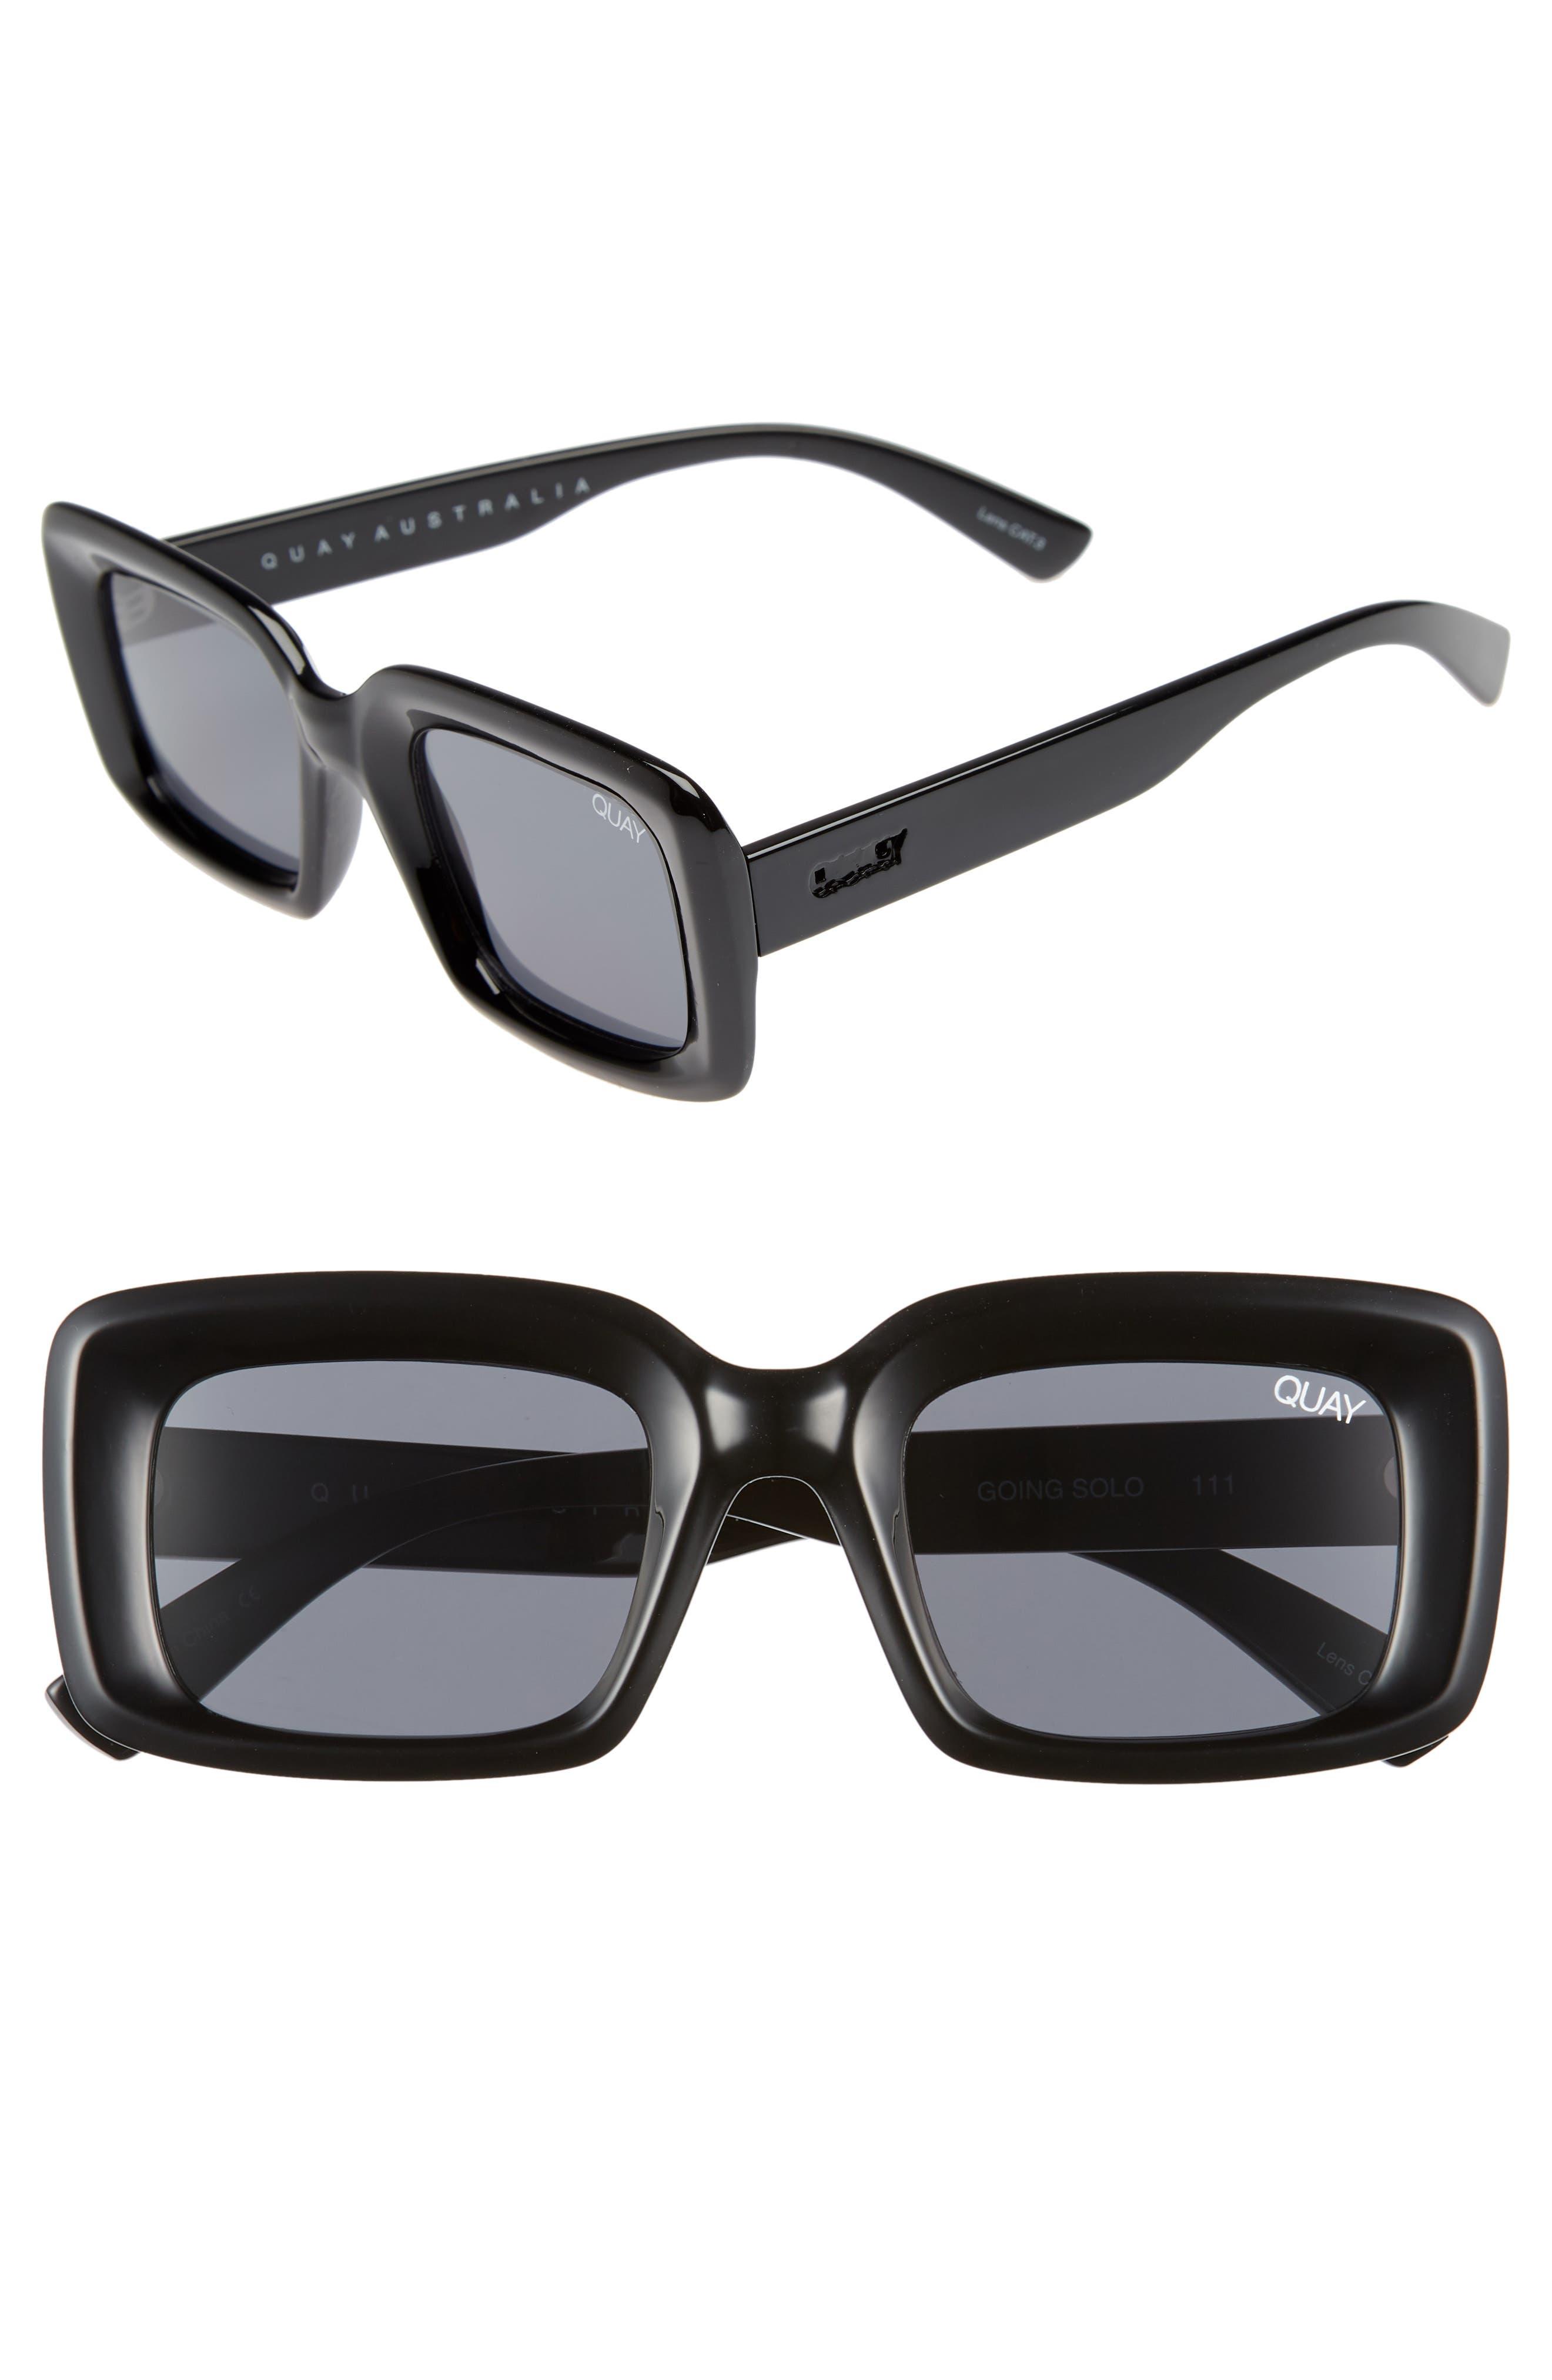 b2e51082ebcea Quay Australia Going Solo 4m Square Sunglasses - Black  Smoke